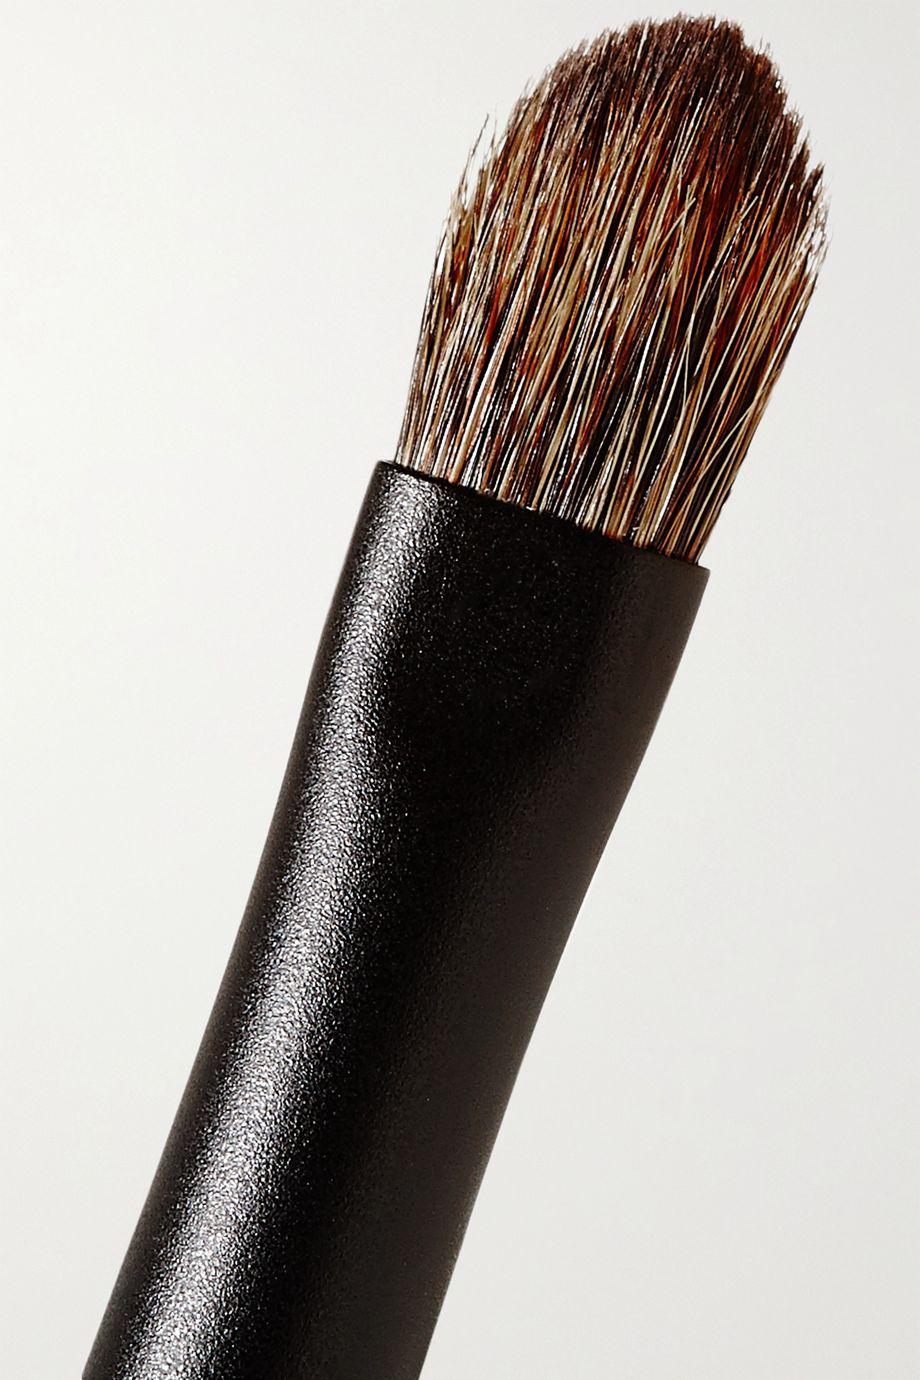 Surratt Beauty Classique Shadow Brush Petite ‒ Lidschattenpinsel